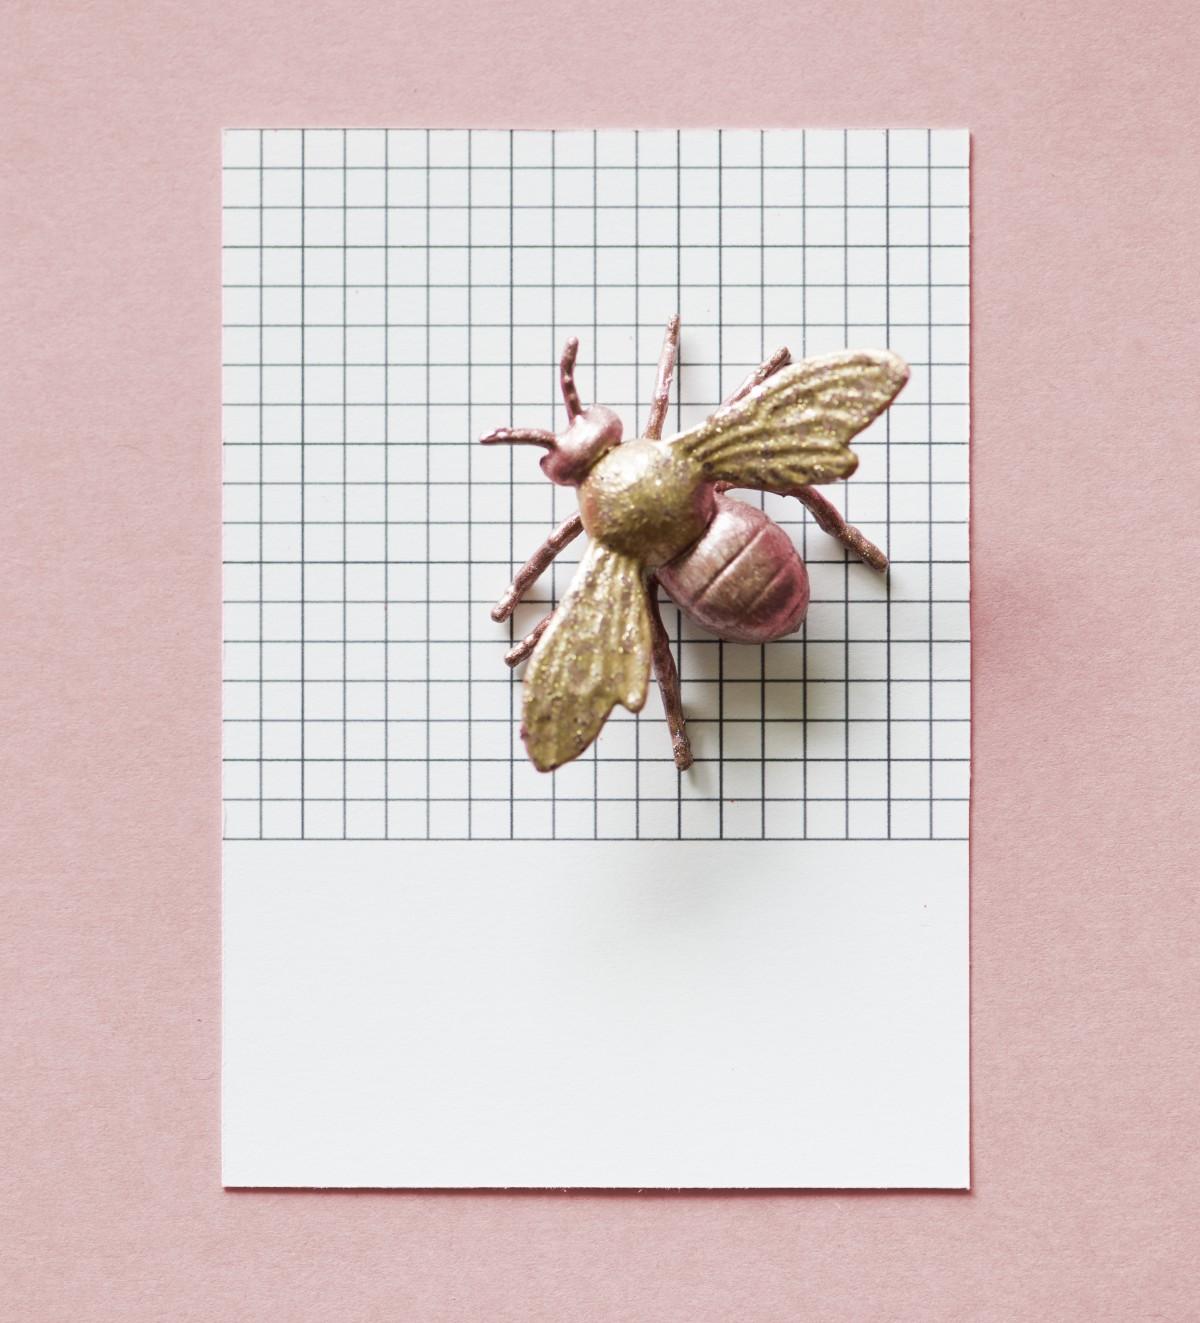 Moths Eating Dog Food